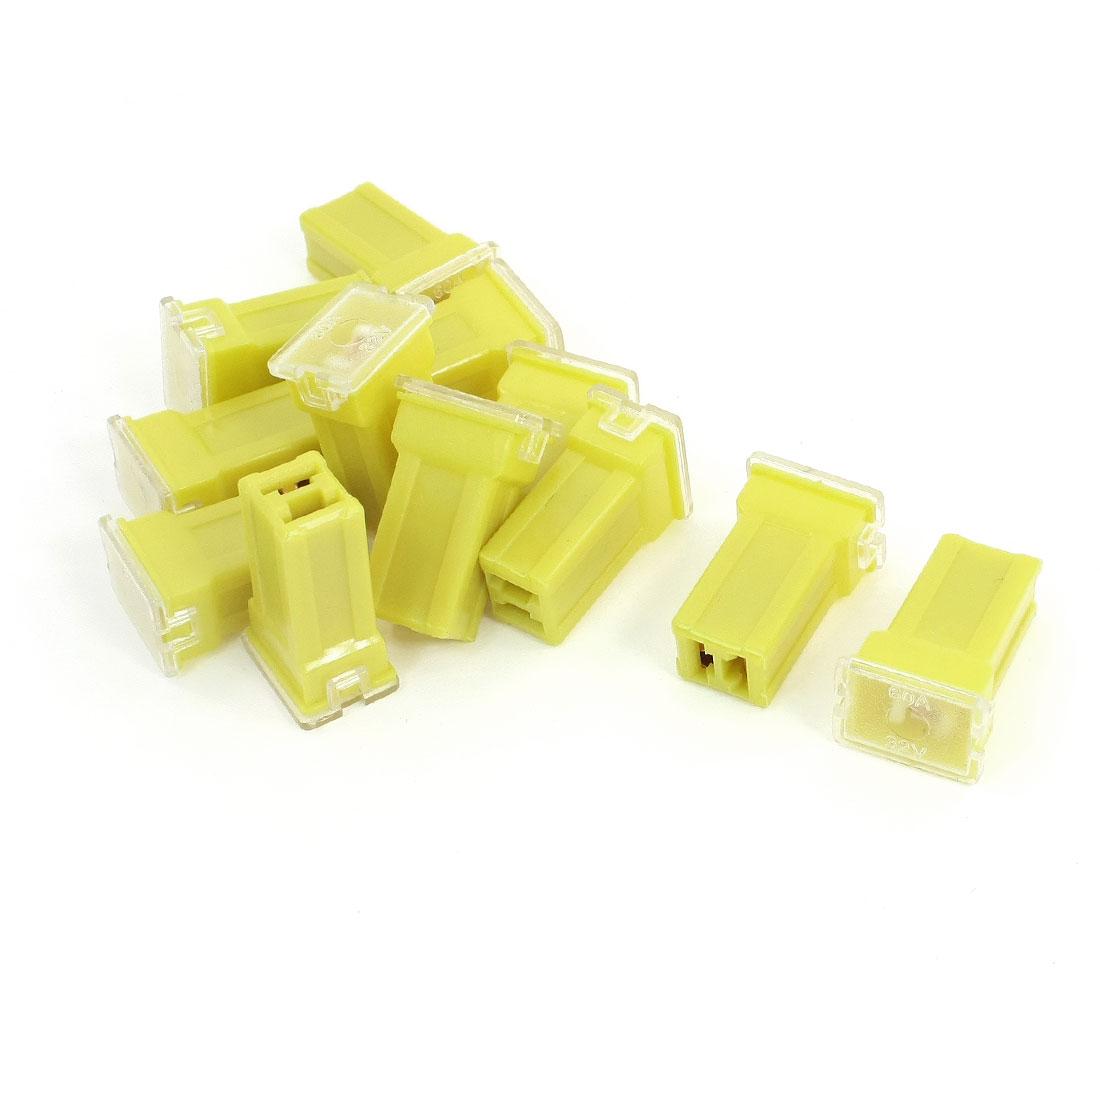 12Pcs DC32V 60A Car Vehicle Automotive 2 Terminals Female PAL Cartridge Circuit Breaker Fuse Yellow